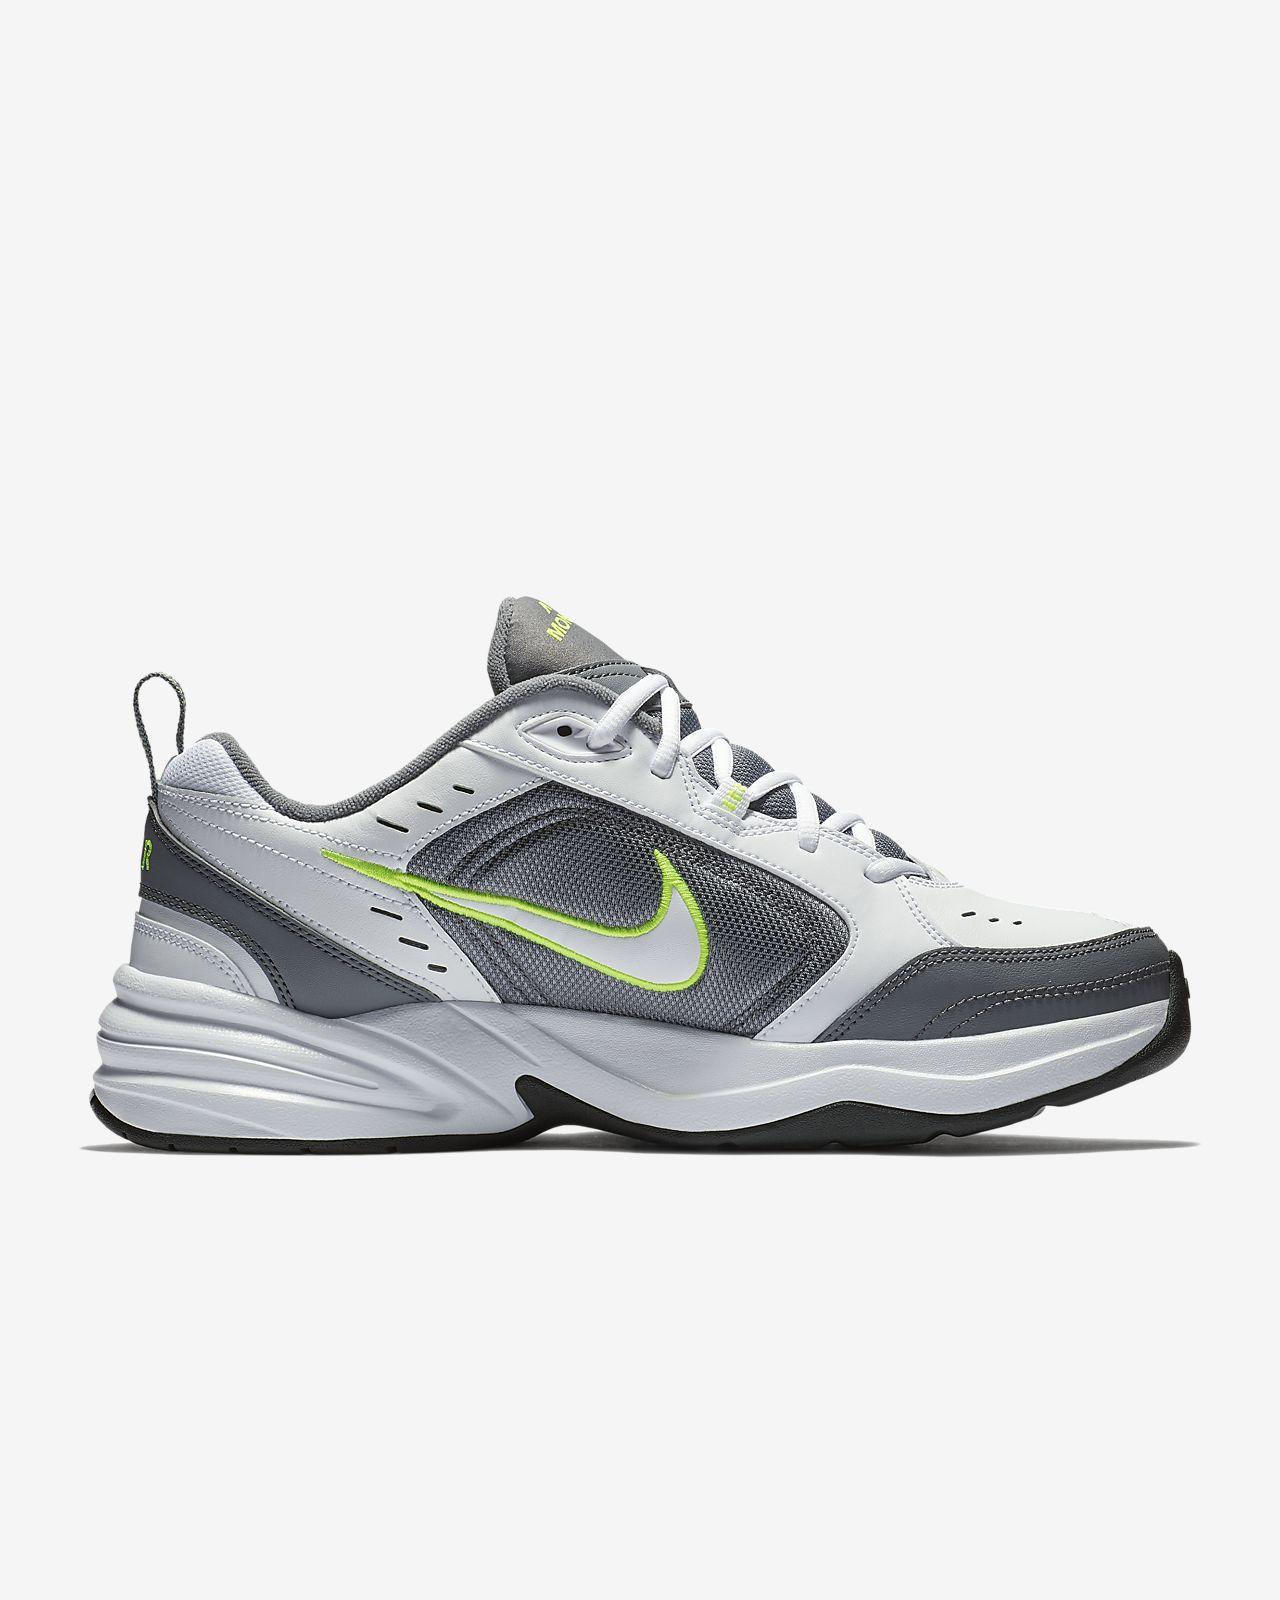 0043fc786a64b Calzado de gimnasio y estilo de vida Nike Air Monarch IV. Nike.com MX